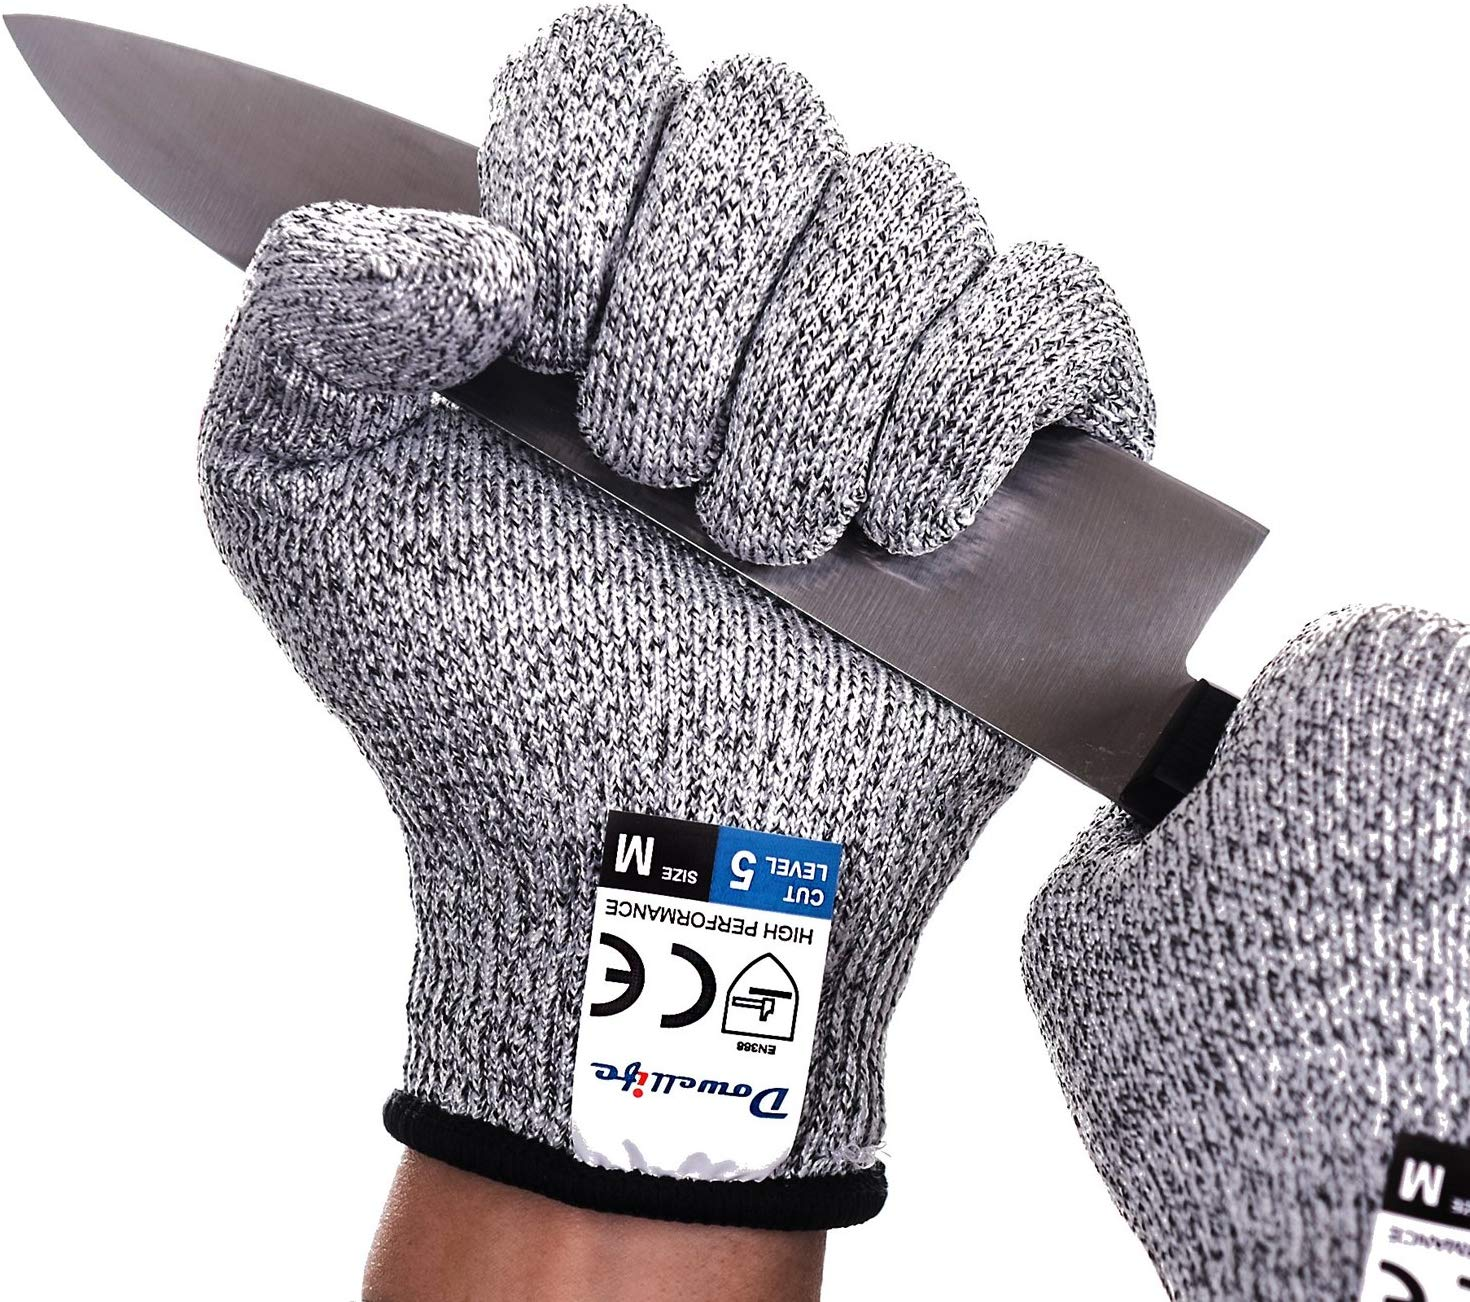 Dowellife cut-resistant glove